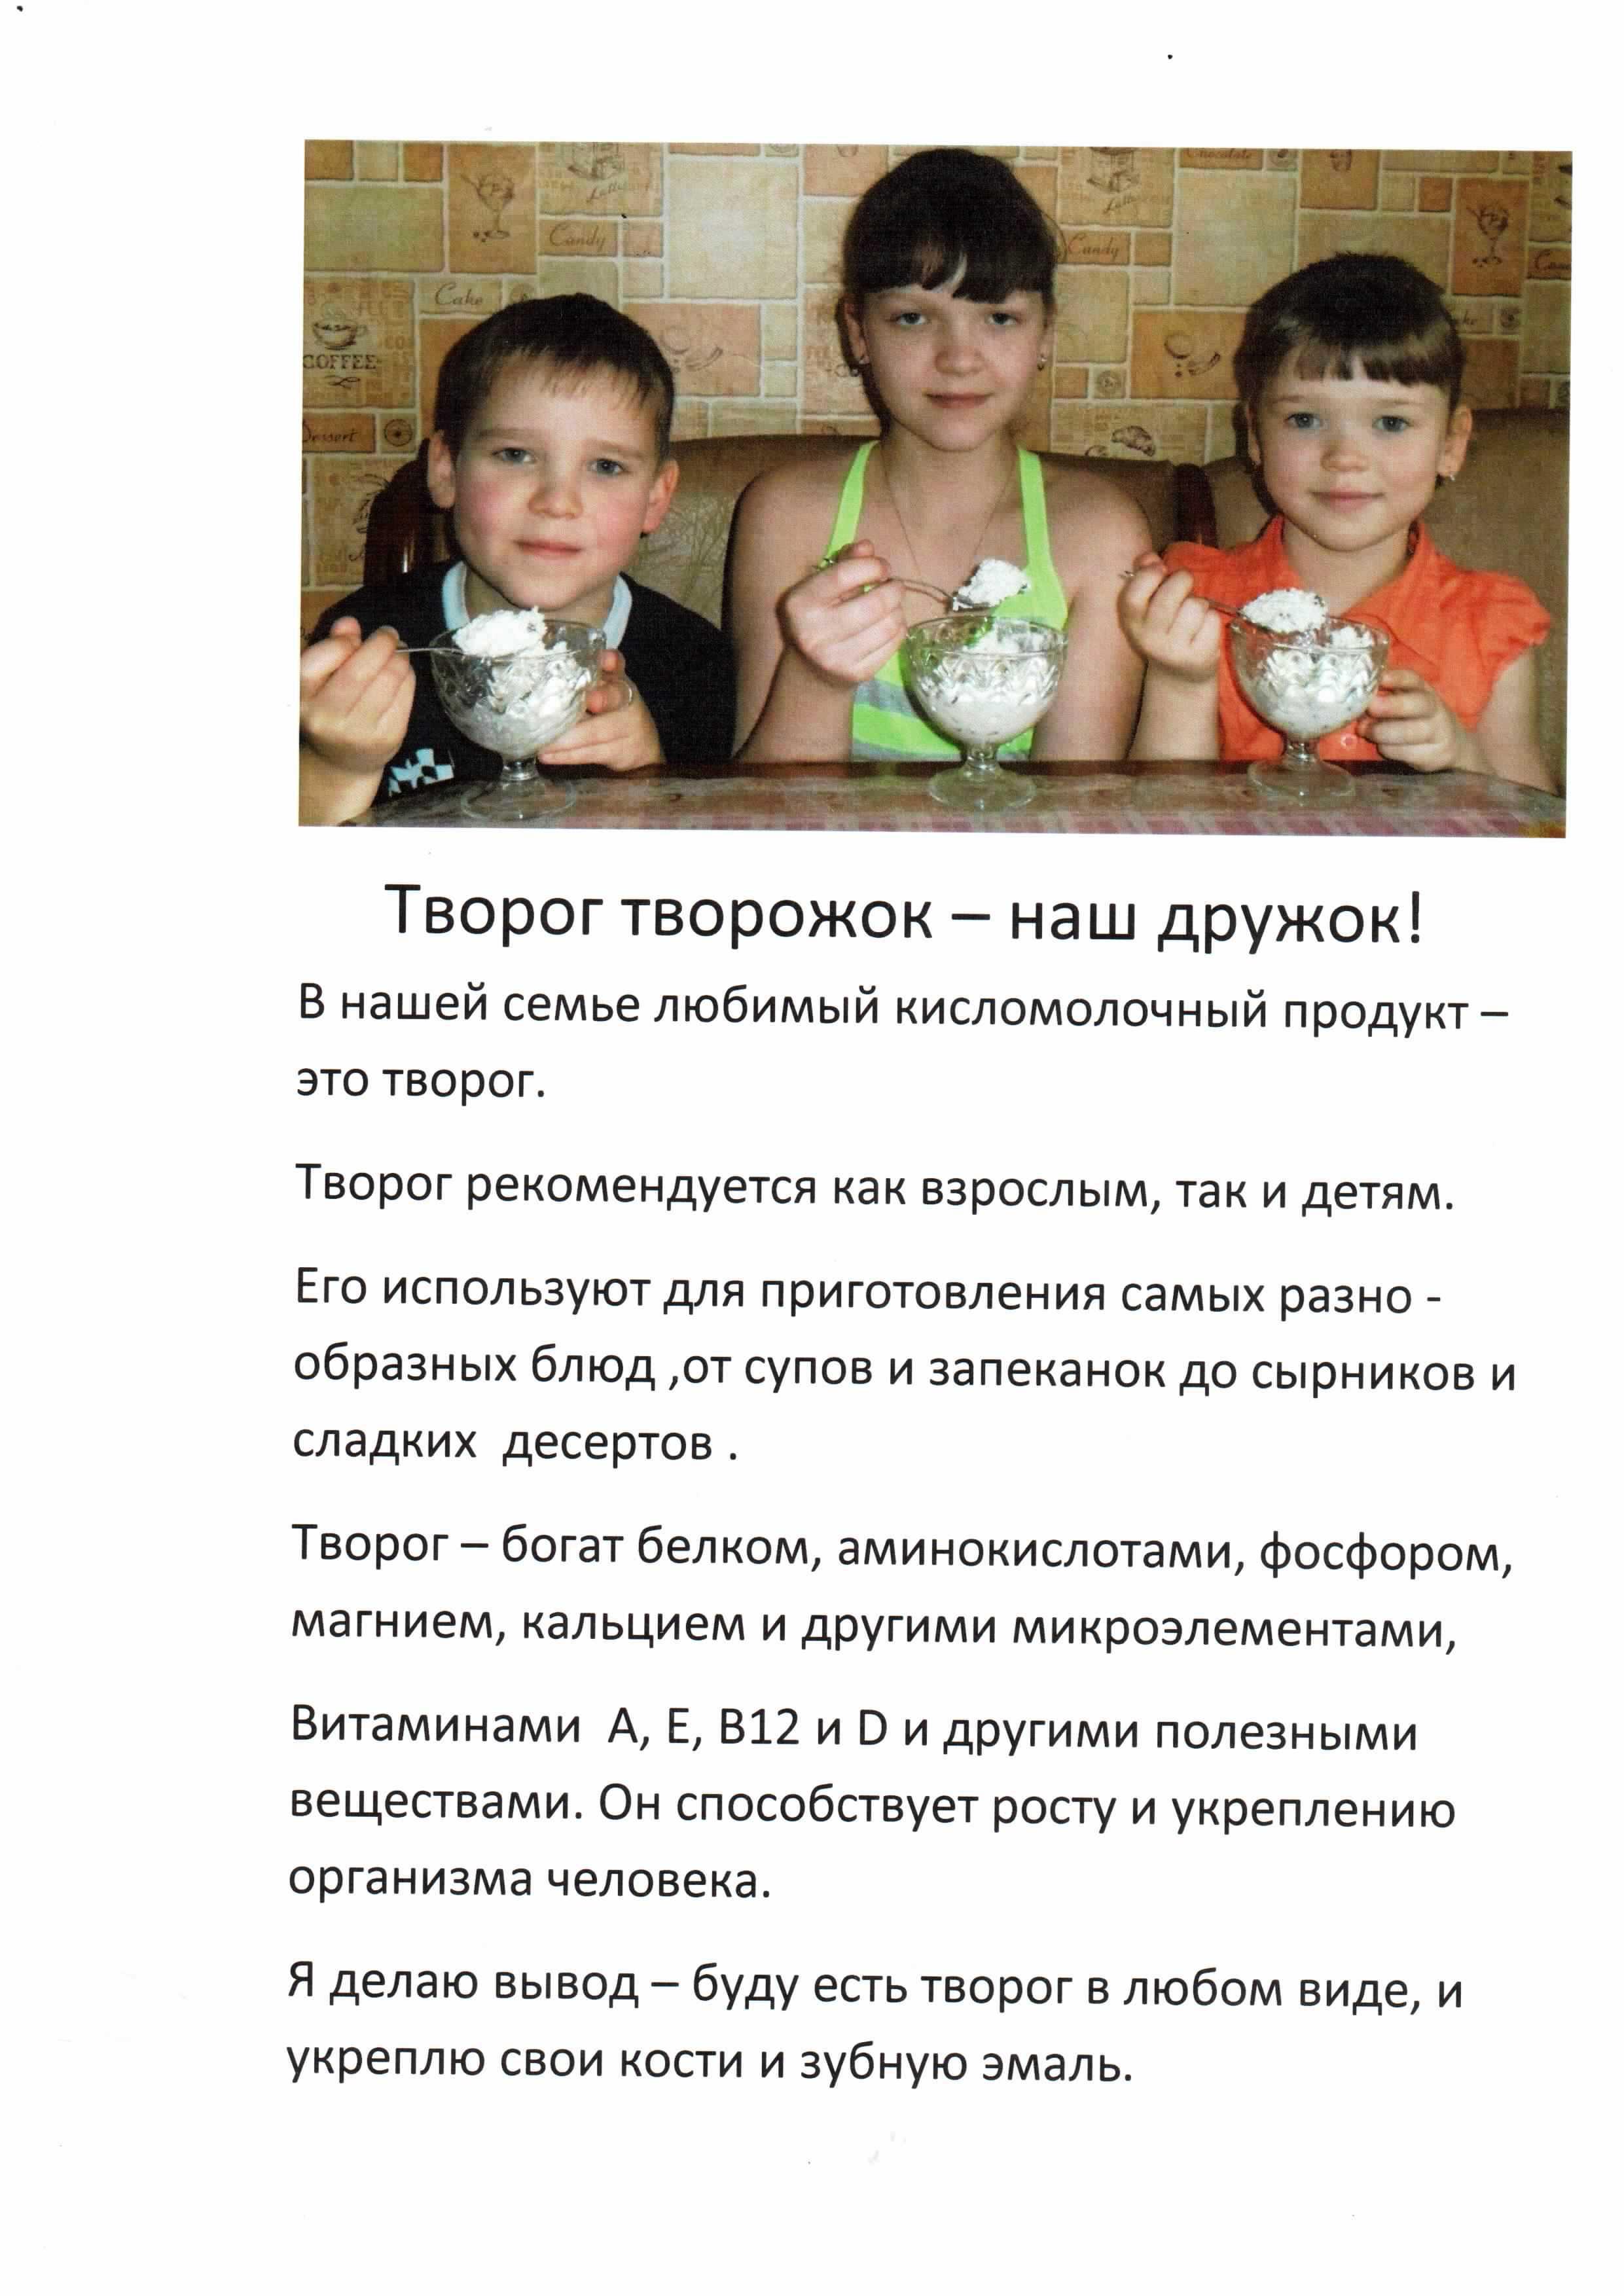 C:\Users\Татьяна\Desktop\питание\_20150118_21485404.jpg